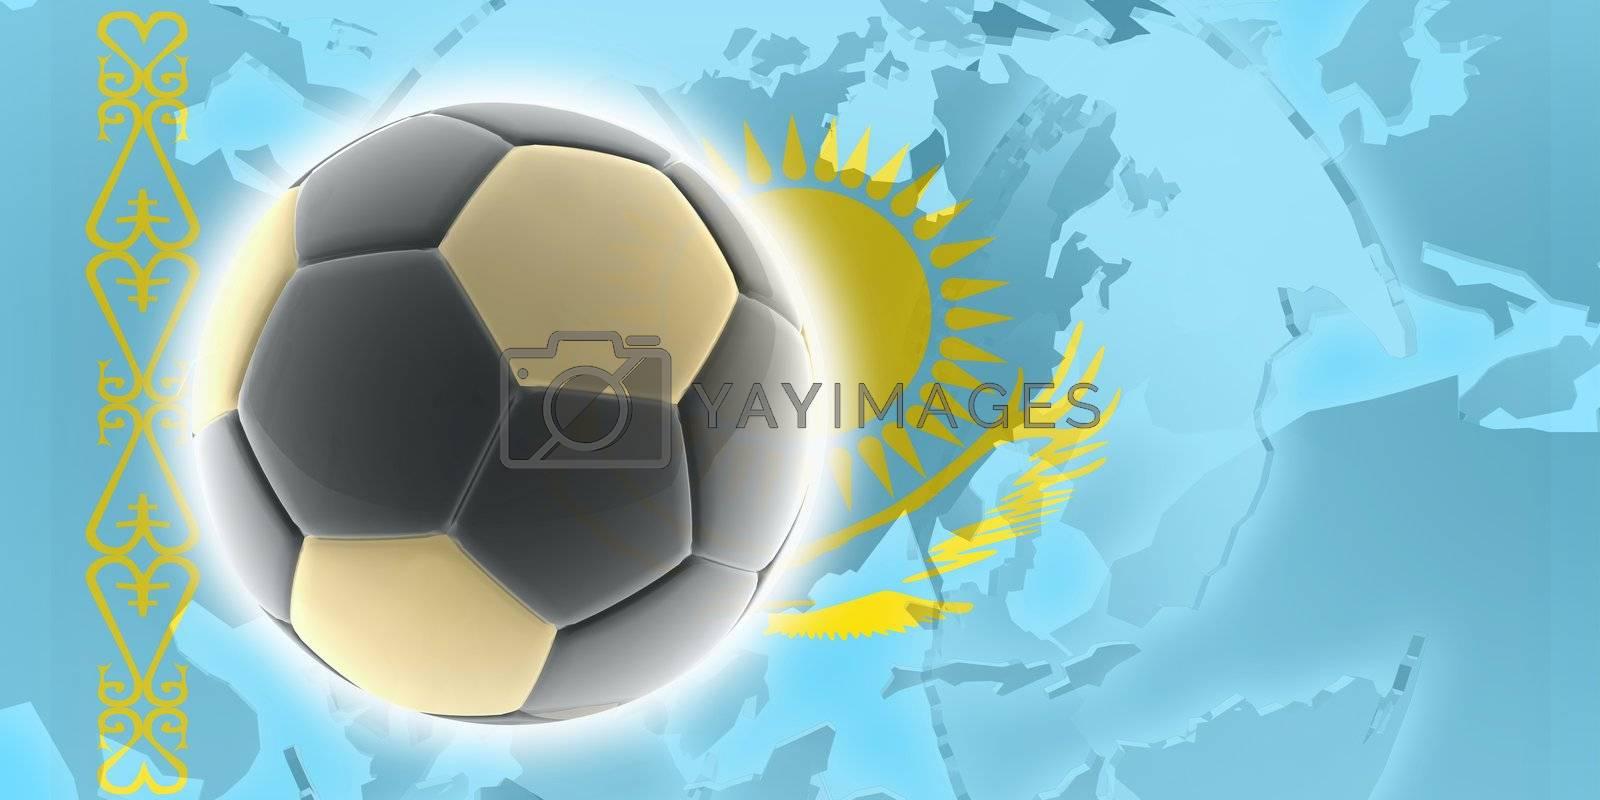 Flag of Kazakhstan, national country symbol illustration sports soccer football